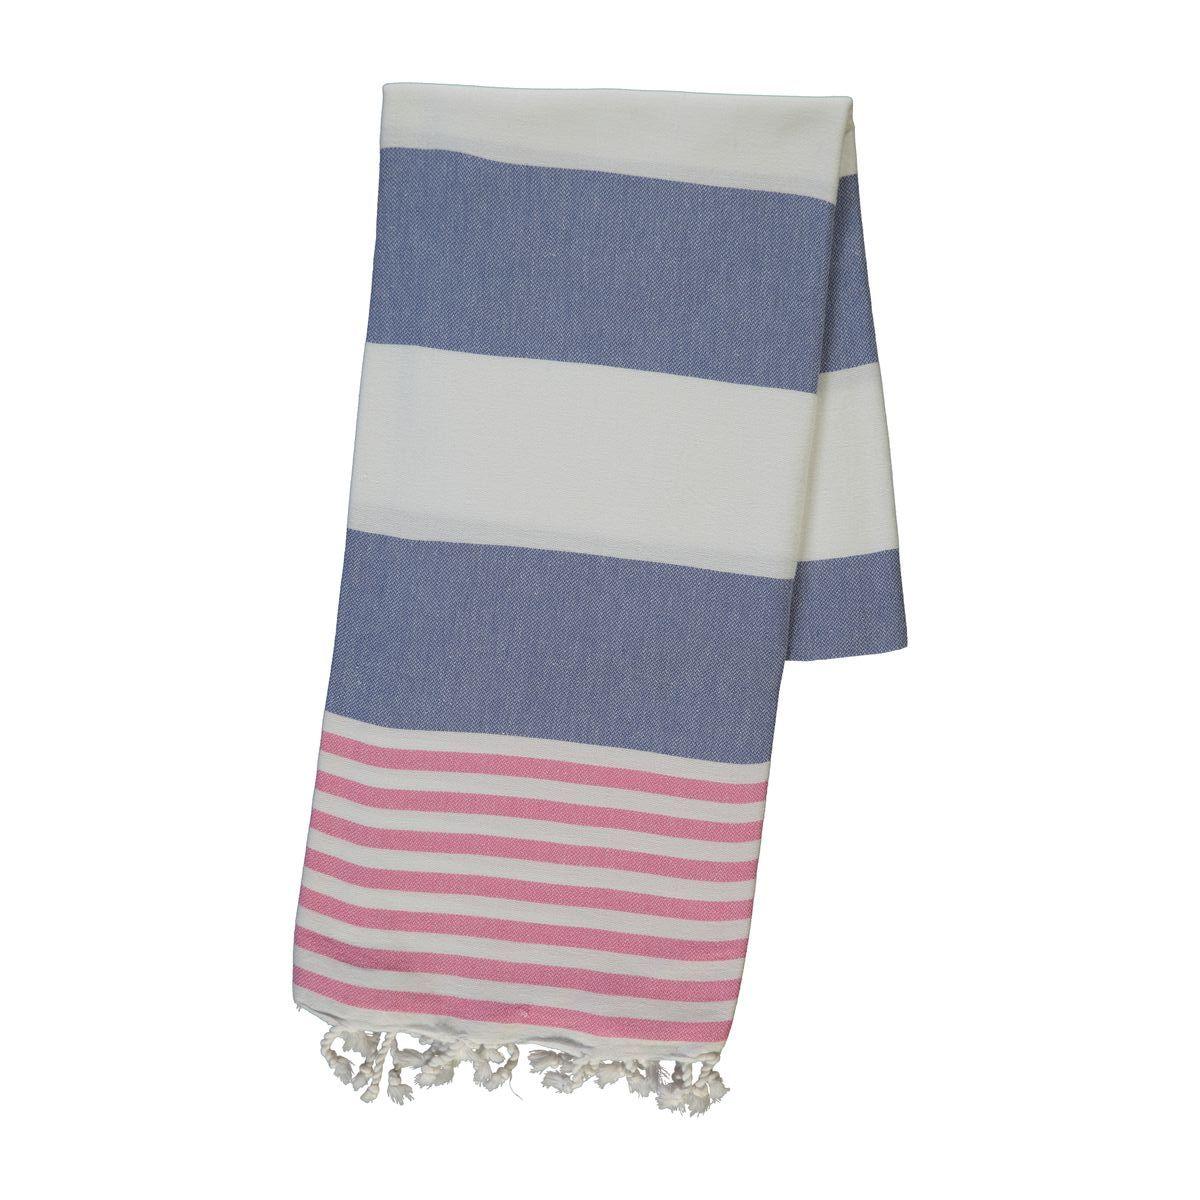 Peshtemal Ladon03 - Pink / Jean Blue